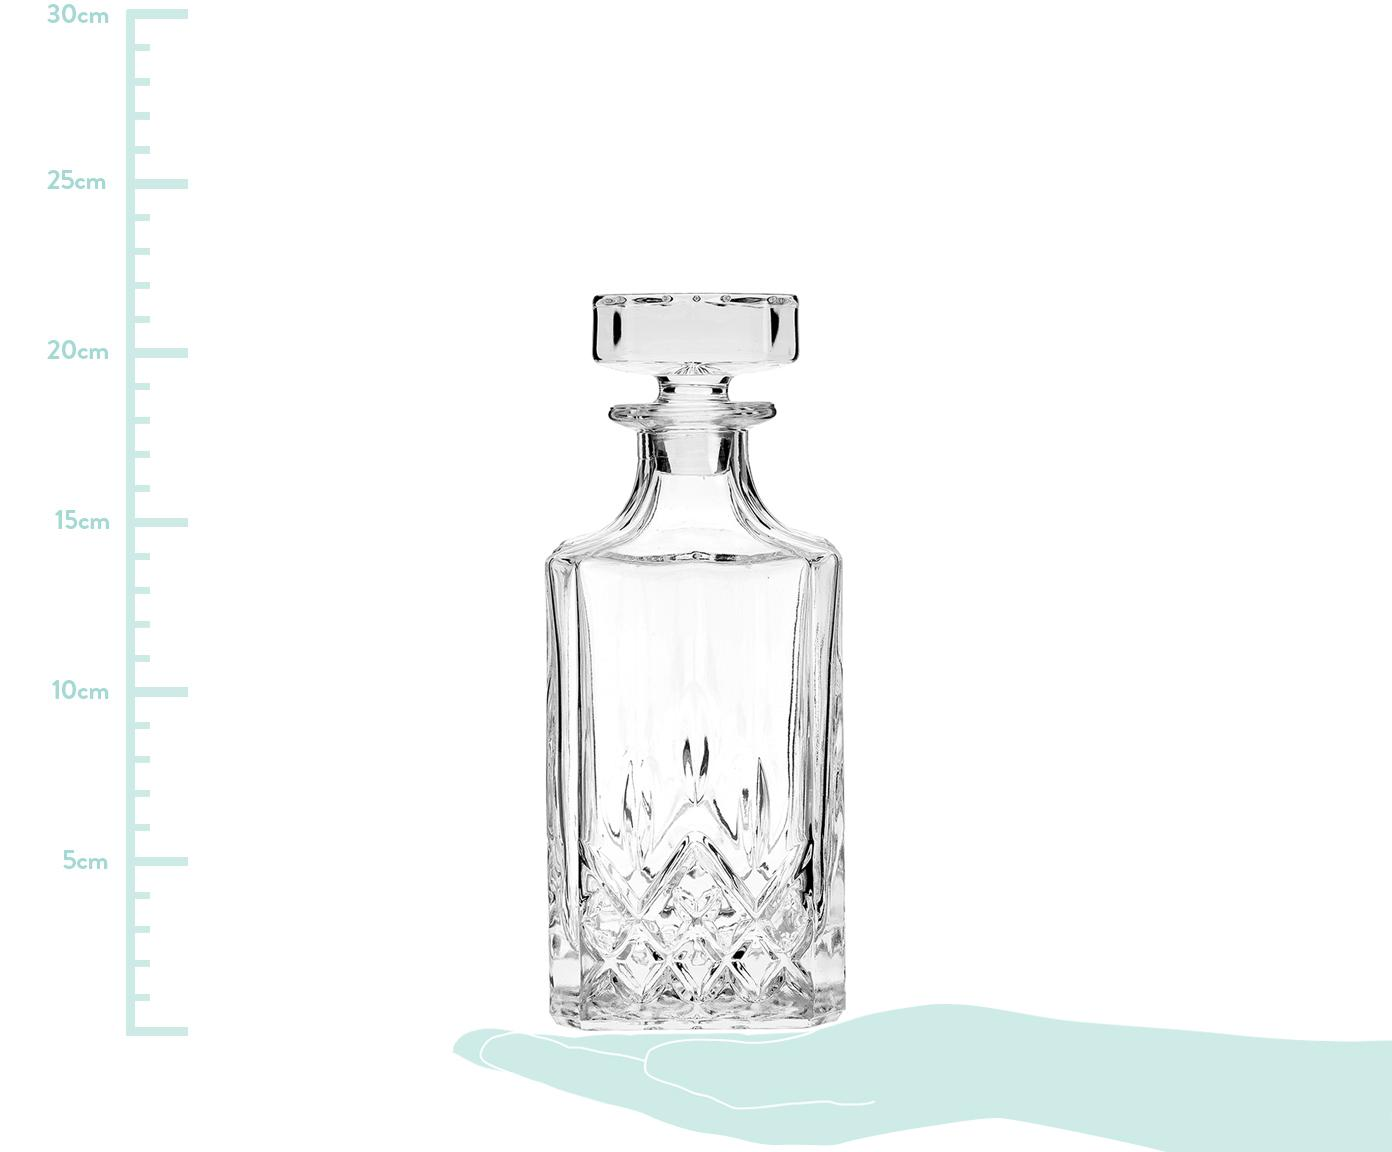 Whisky-Set George mit Kristallrelief, 3 tlg., Glas, Transparent, Ø 8 x H 22 cm